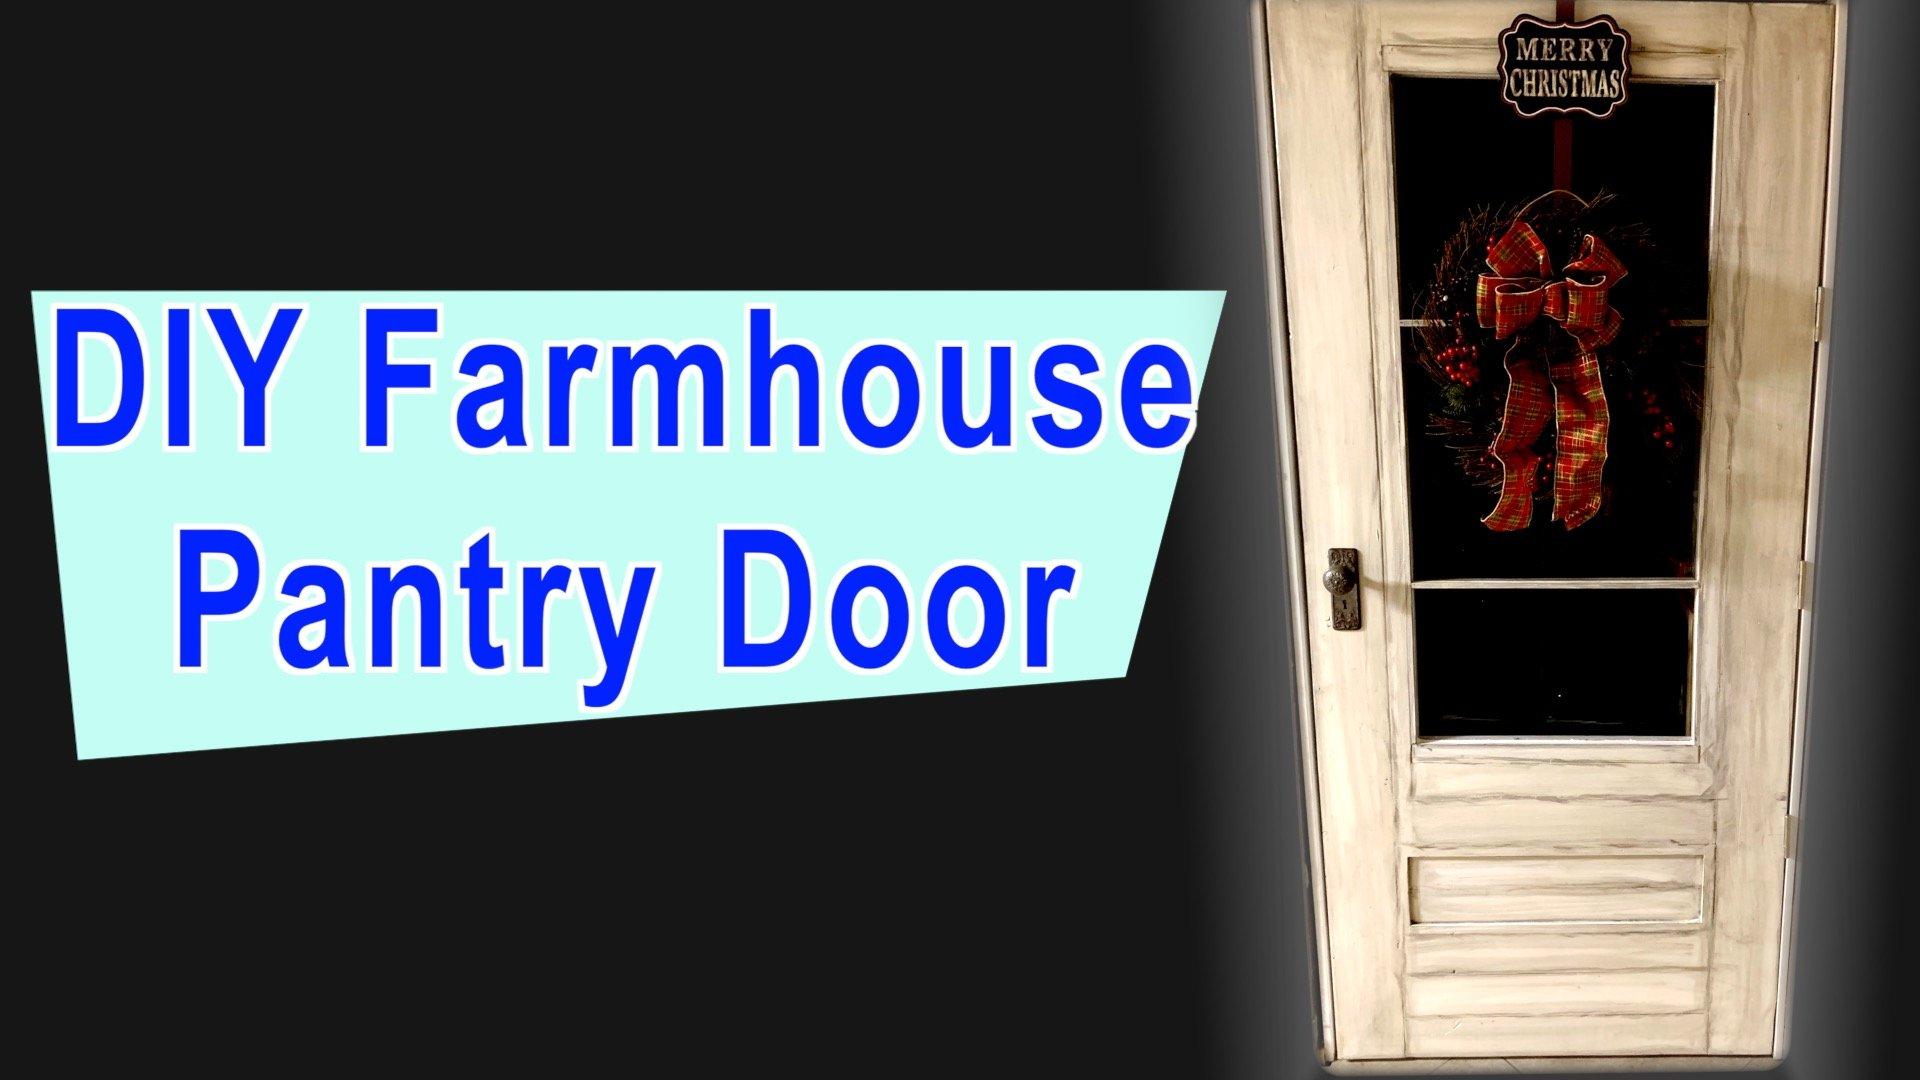 DIY Farmhouse Pantry Door with Glass